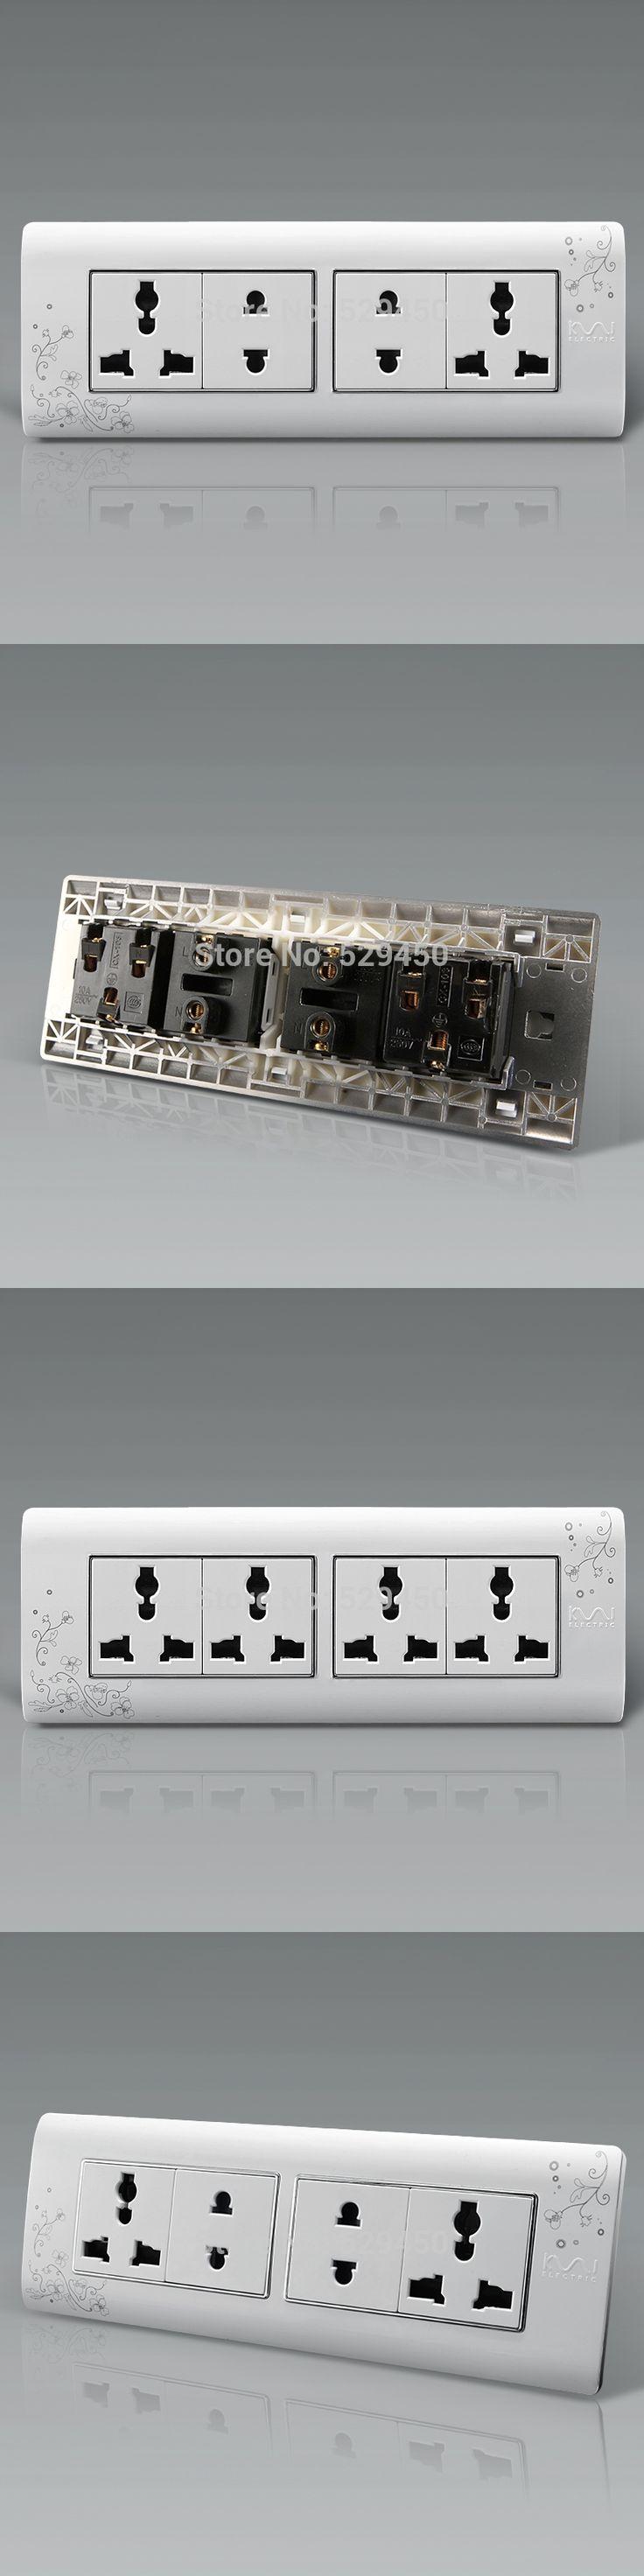 Universal Plug Kempinski Luxury Wall Electrical Socket, Multi-function 12 / 10 hole power outlet